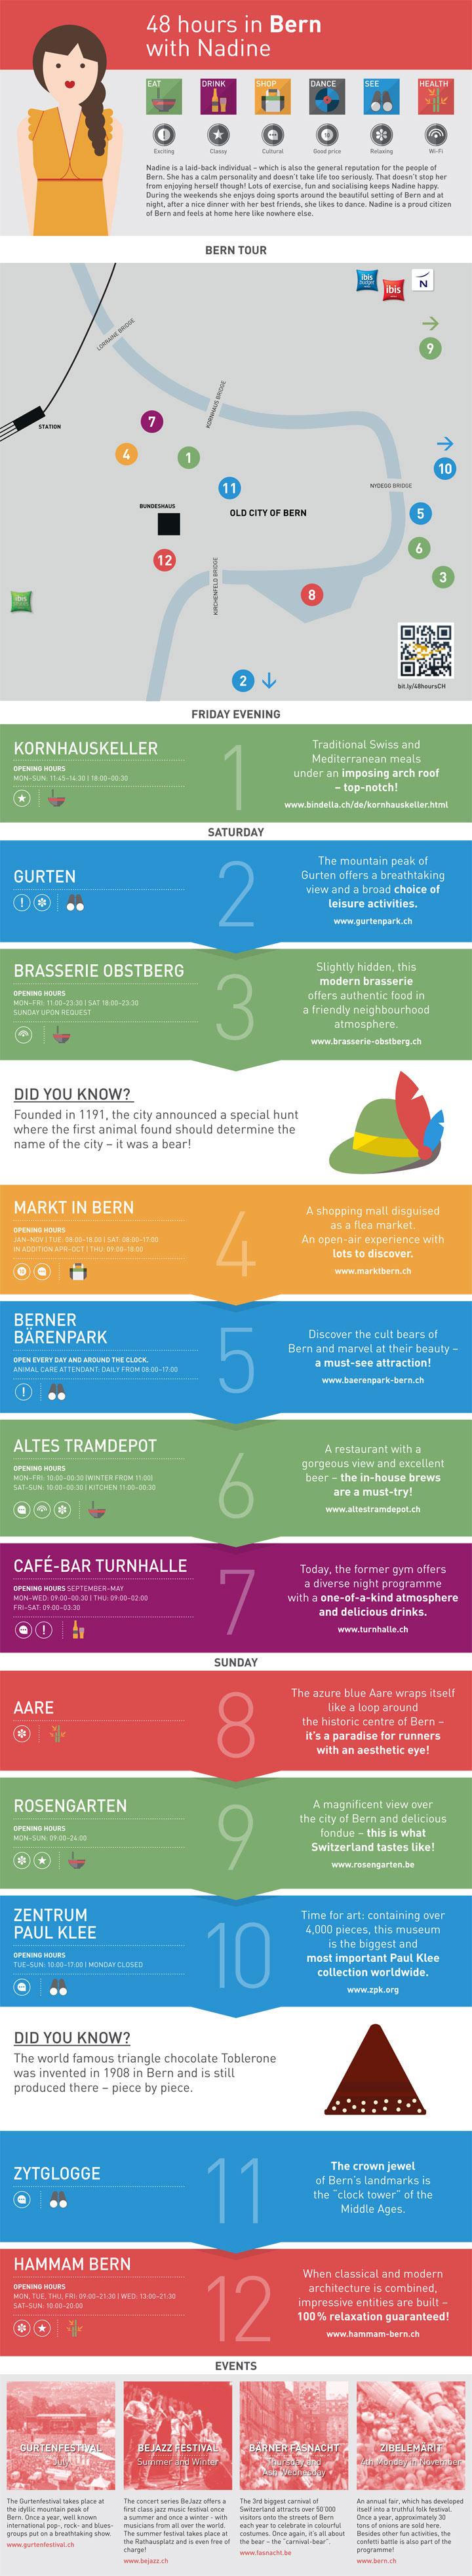 Bern Infographic